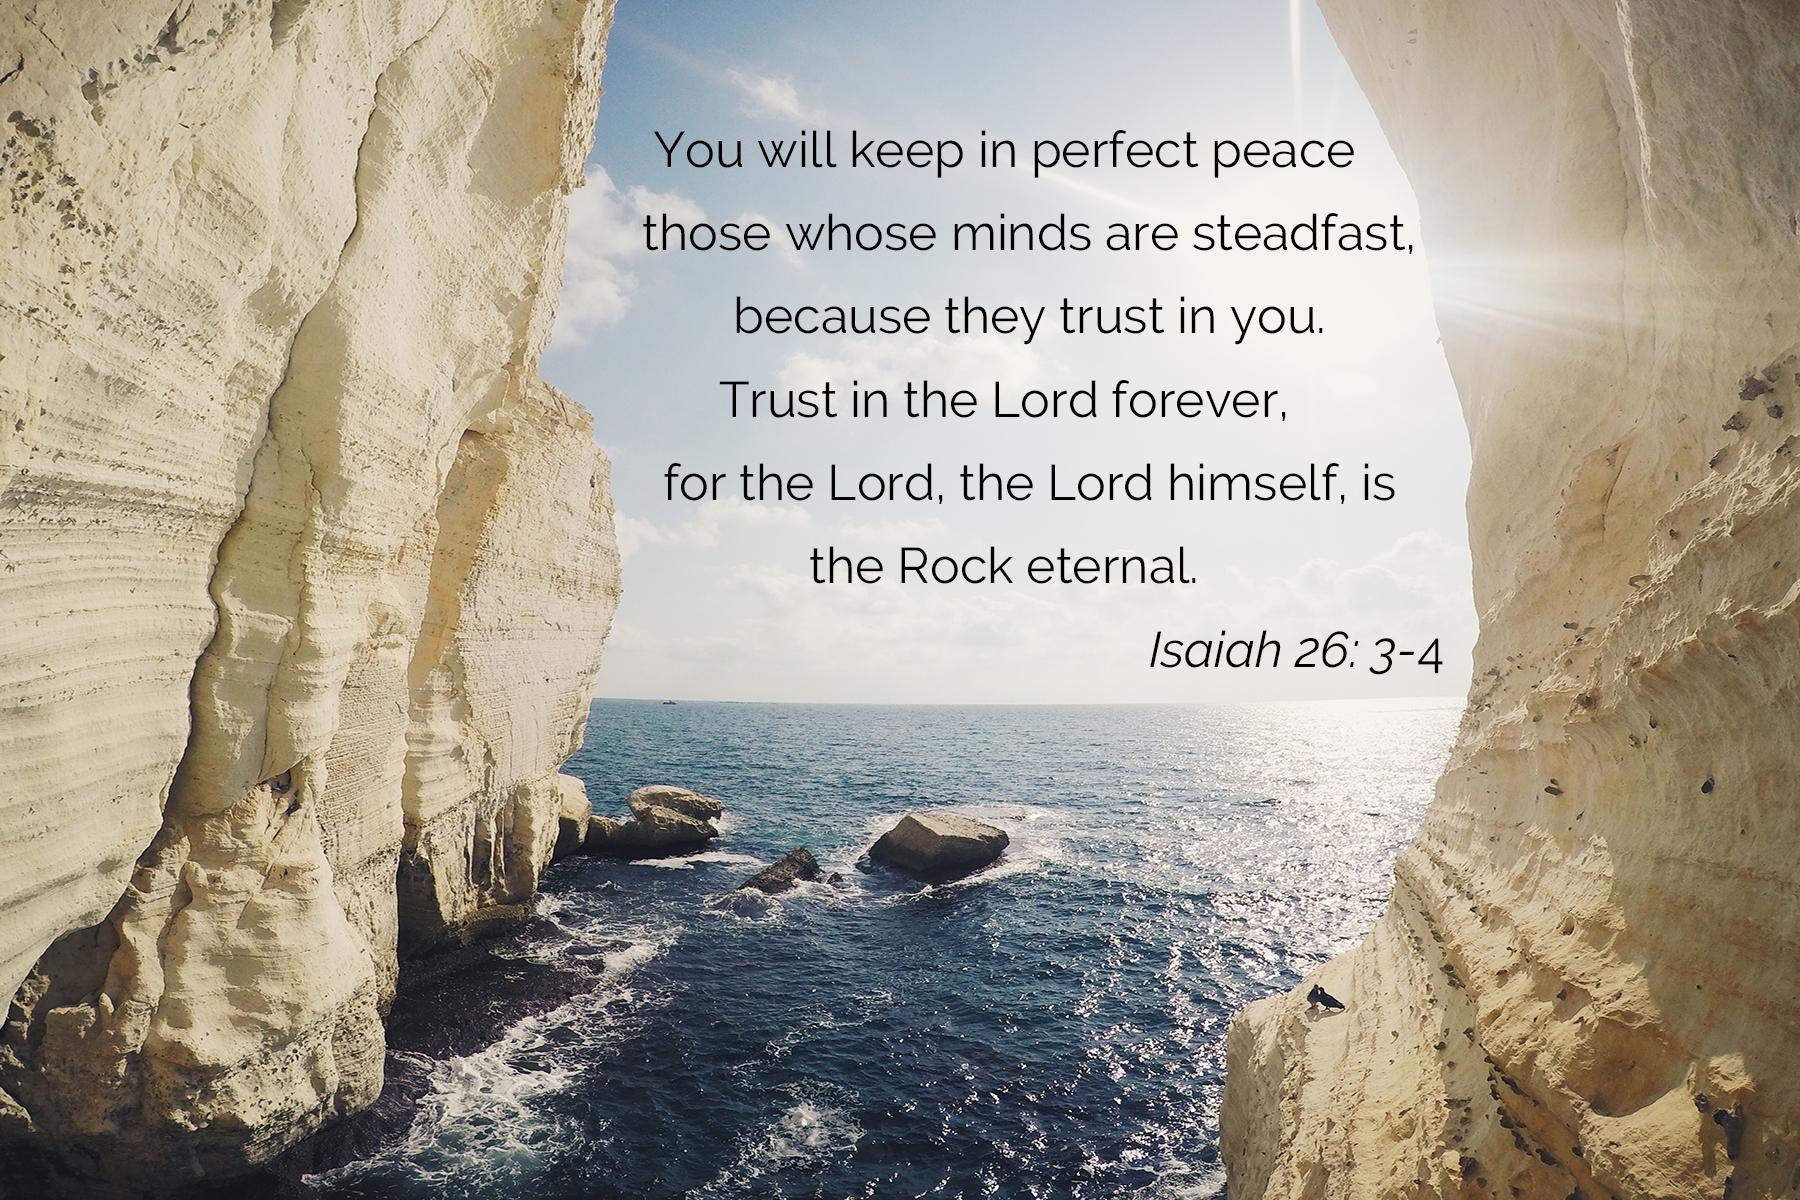 Isaiah 26: 4